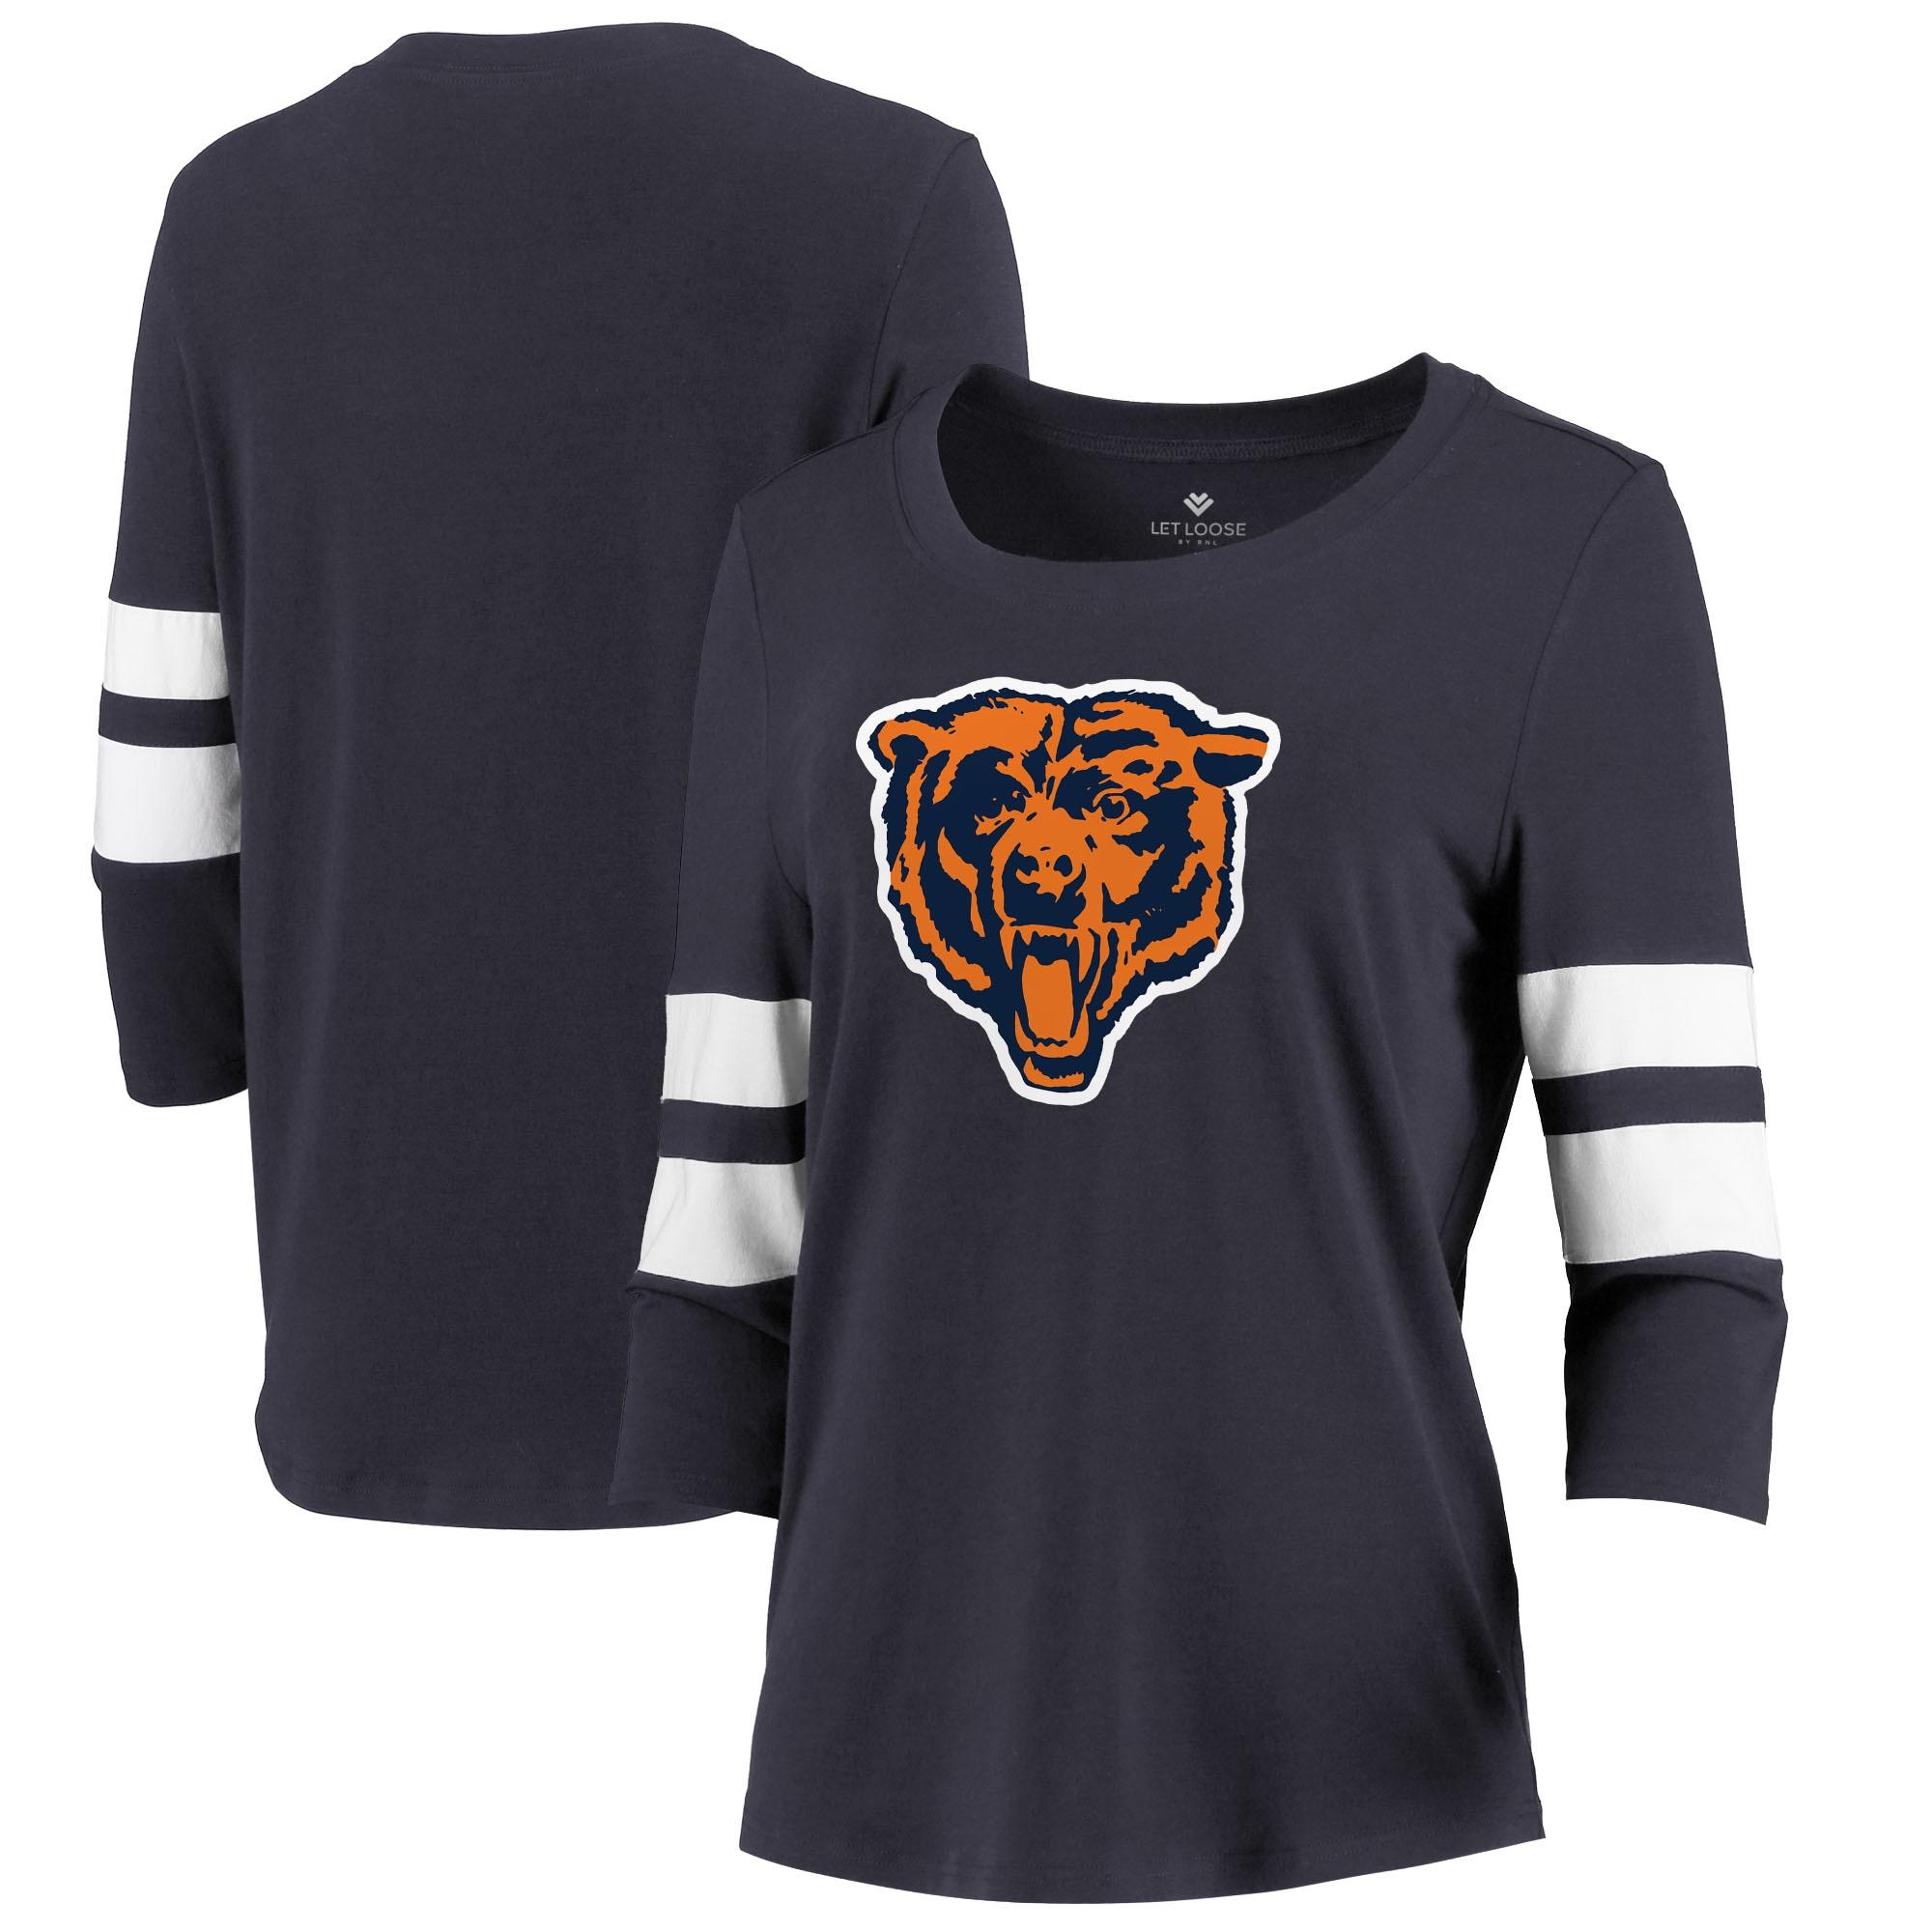 Chicago Bears Let Loose by RNL Women's Team Logo Stripe Tri-Blend 3/4 Sleeve T-Shirt - Navy